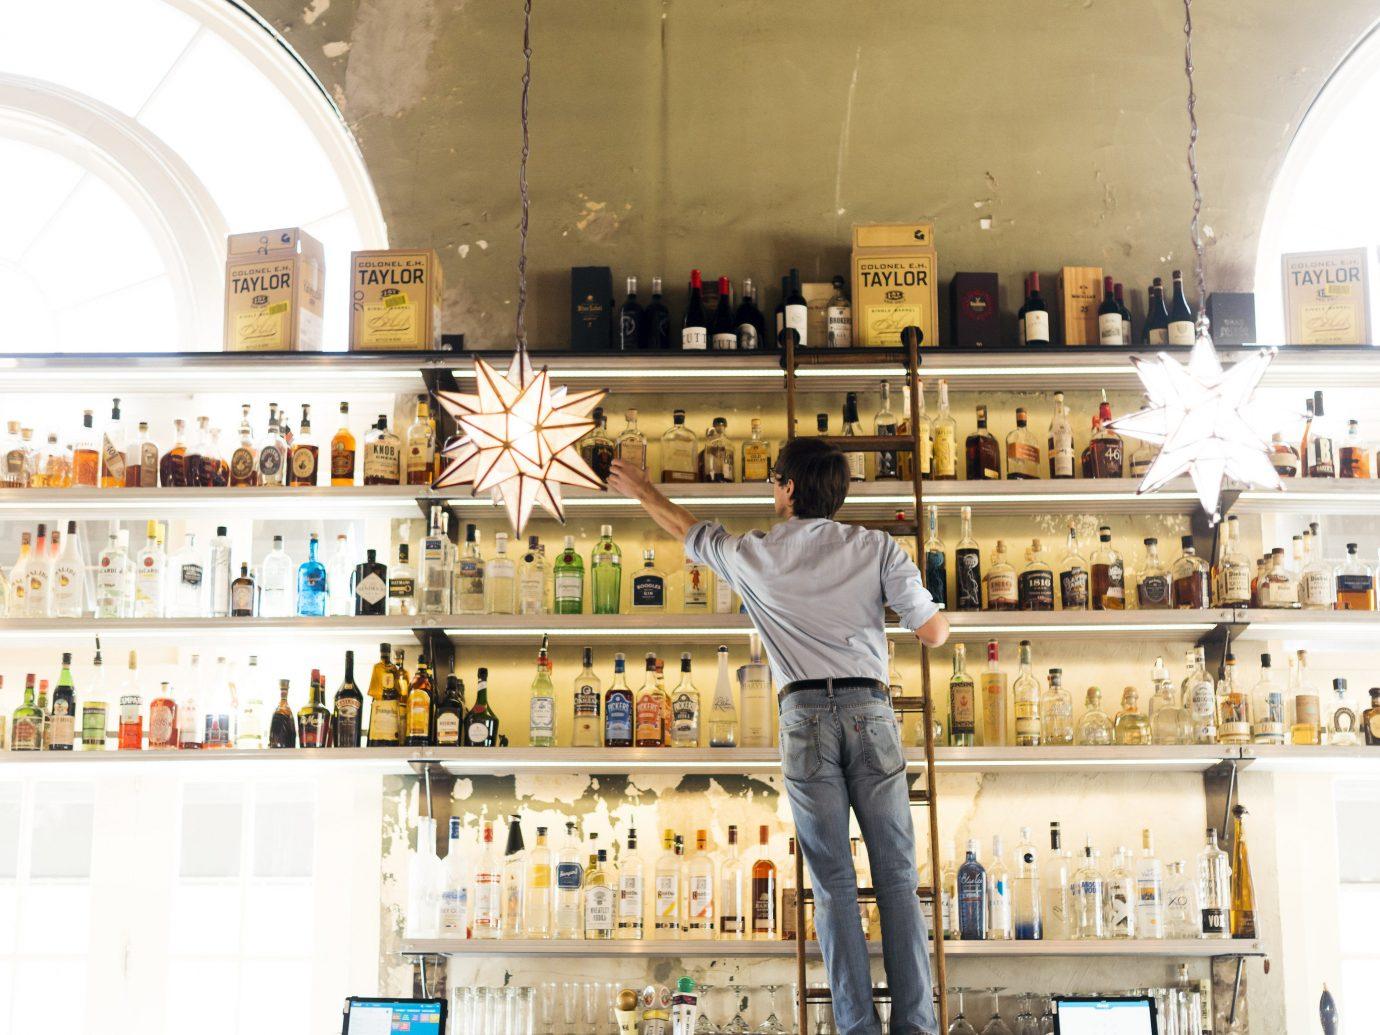 Trip Ideas indoor building retail interior design grocery store liquor store counter